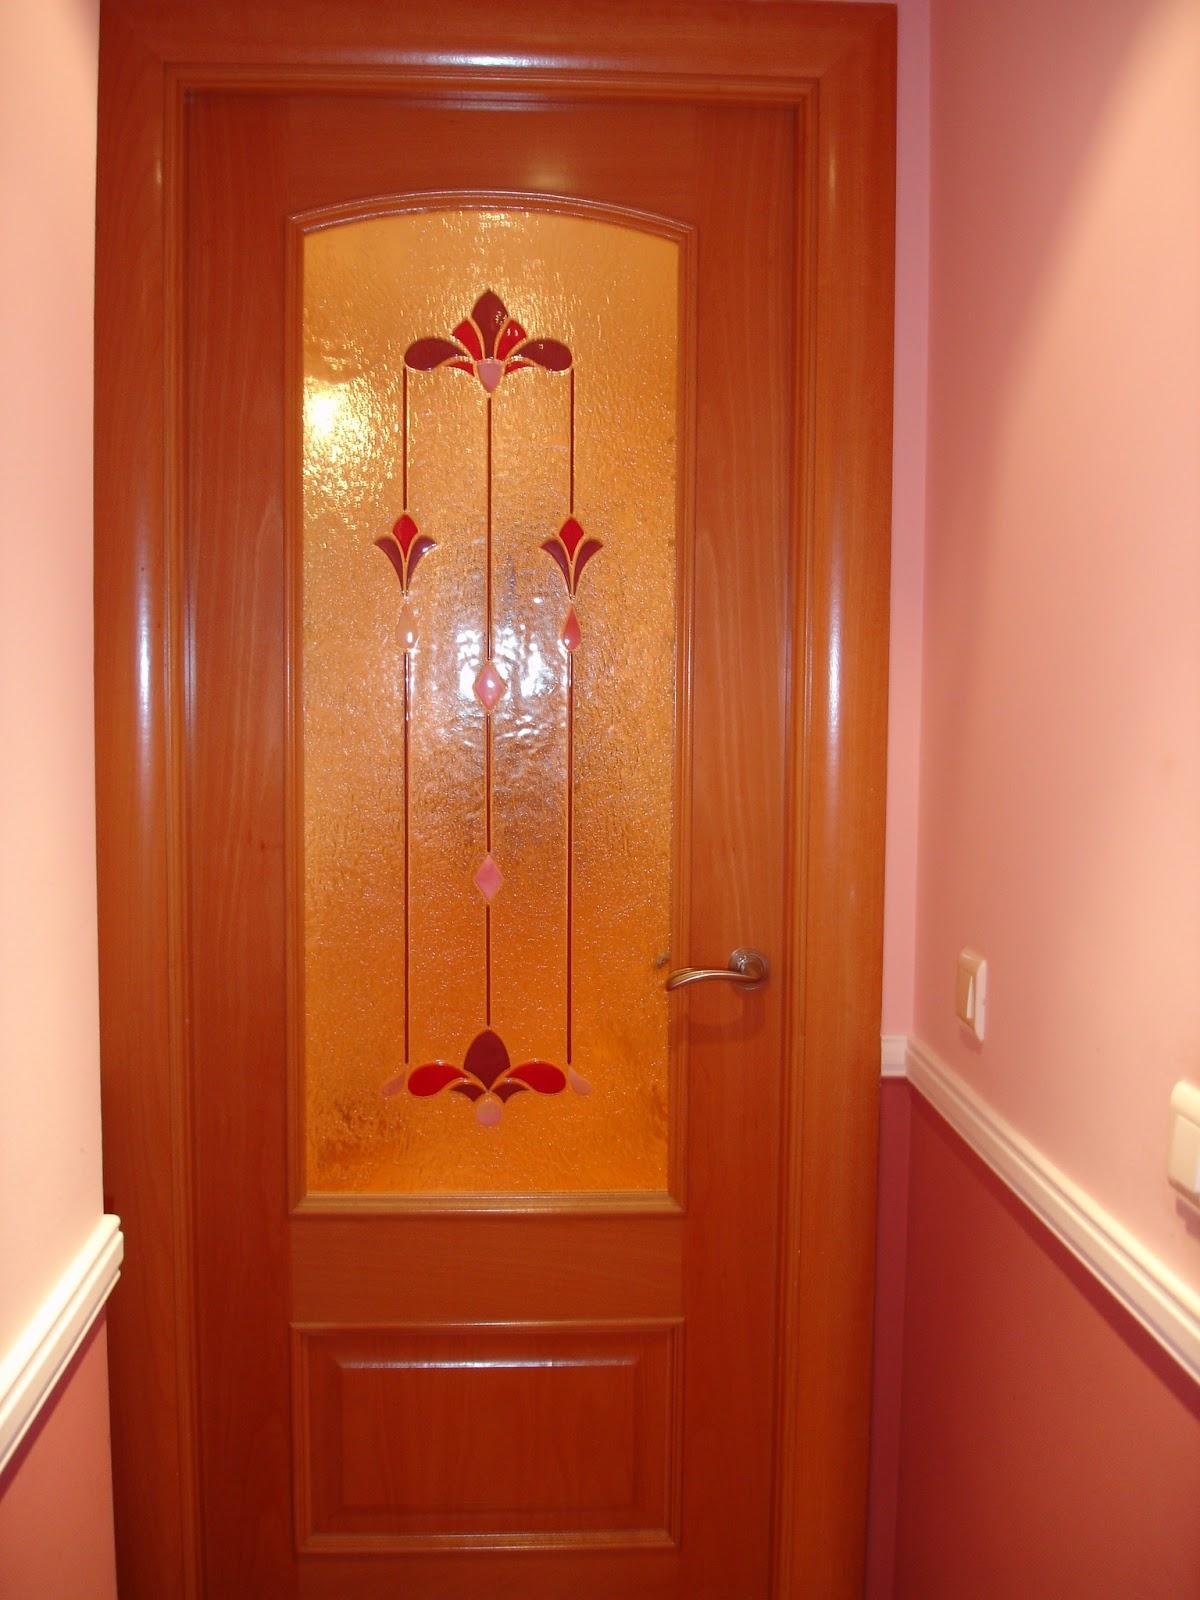 Vidrios para puertas interiores great vidrios para for Cristales para puertas de madera